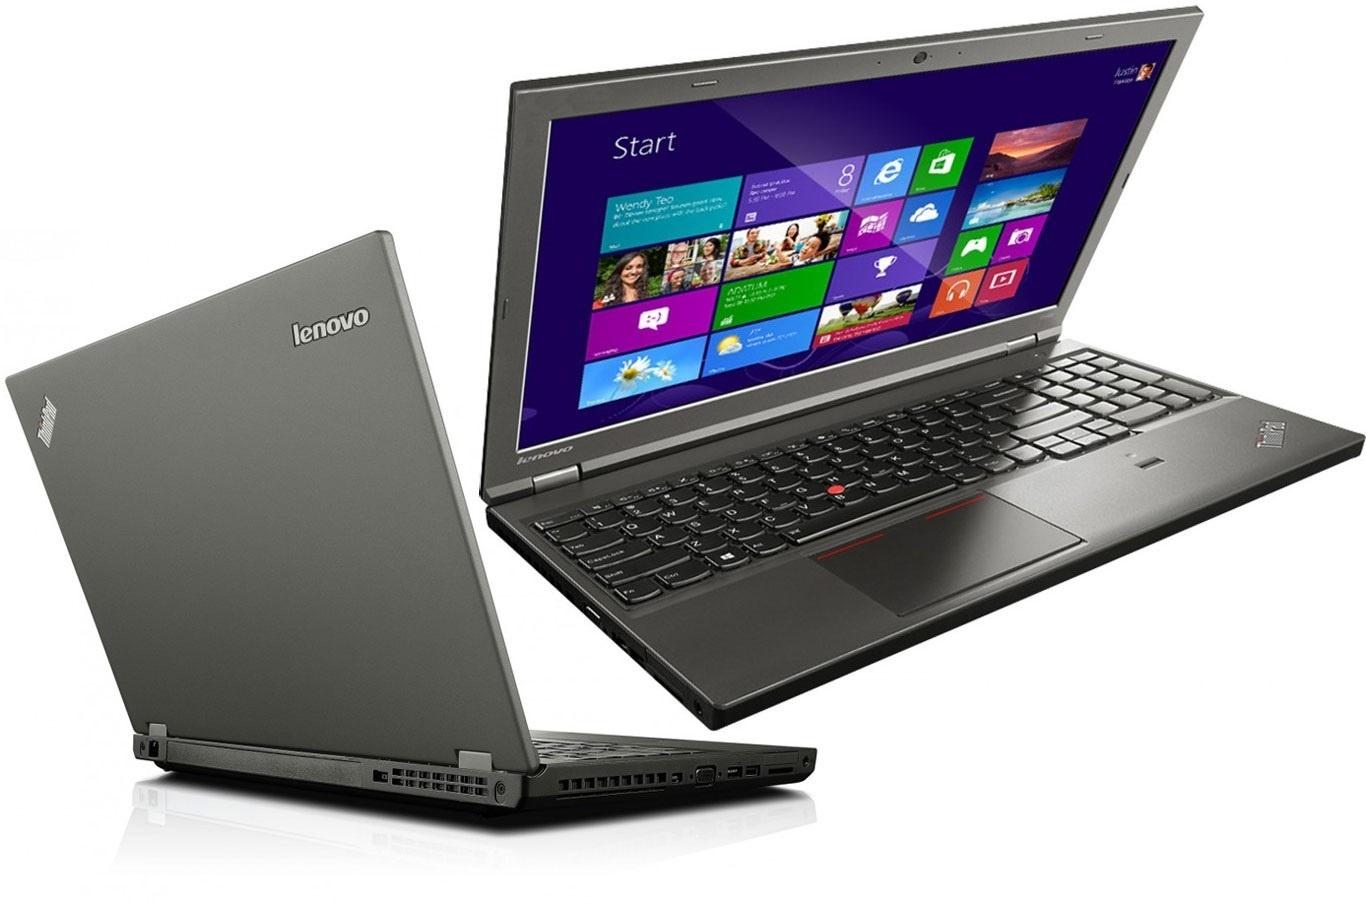 Lenovo Thinkpad W540 pantone color calibrator